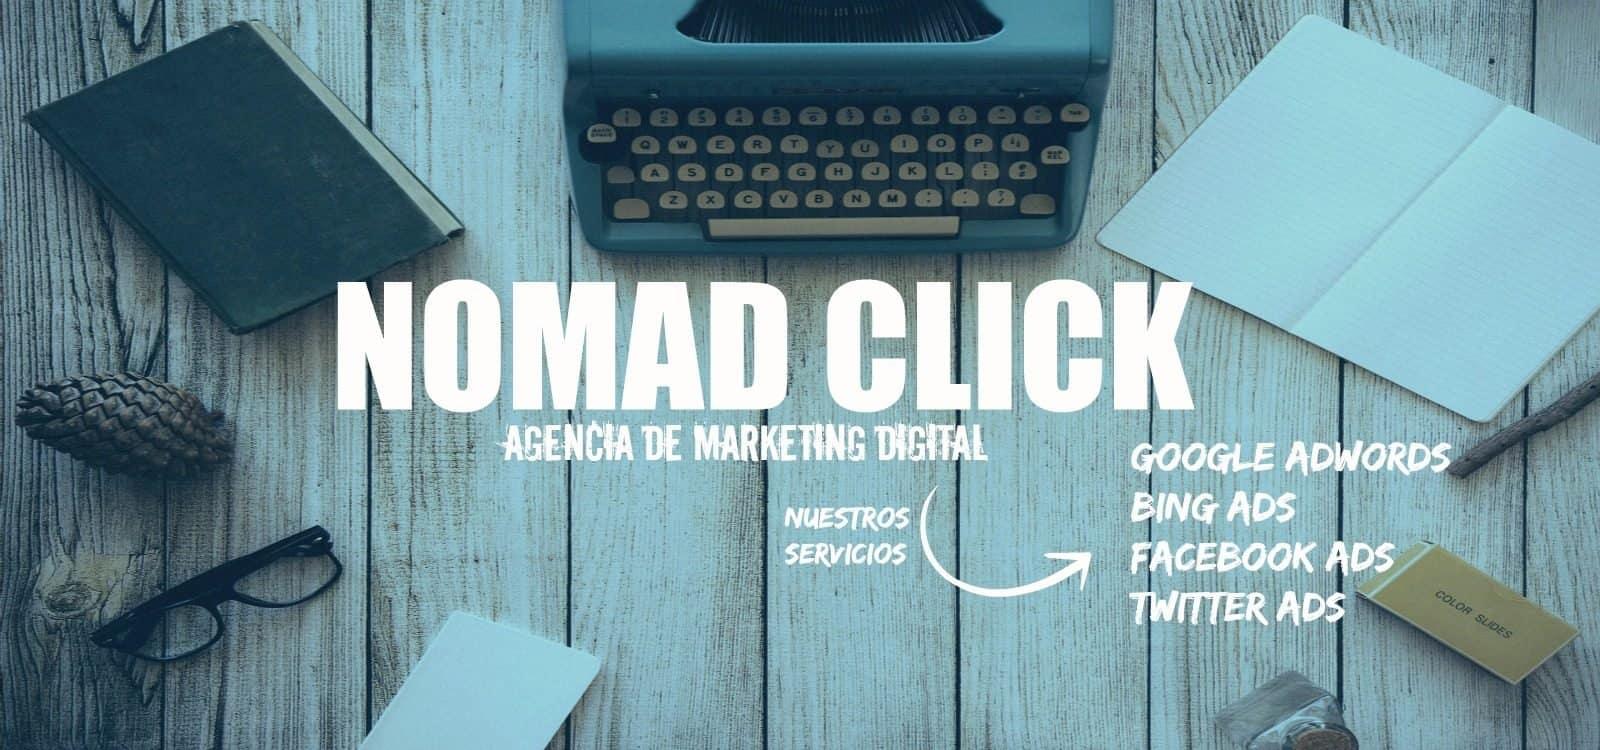 Nomad Click